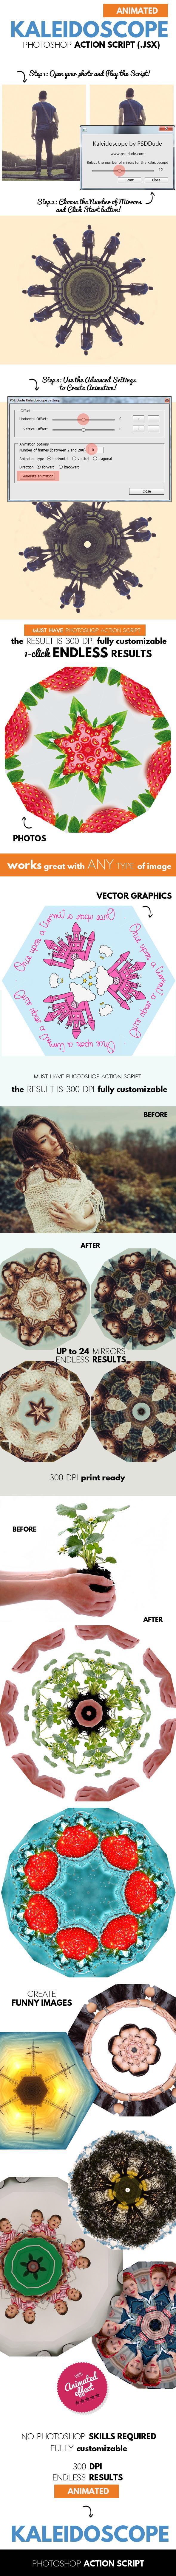 Animated Kaleidoscope Photoshop Tool